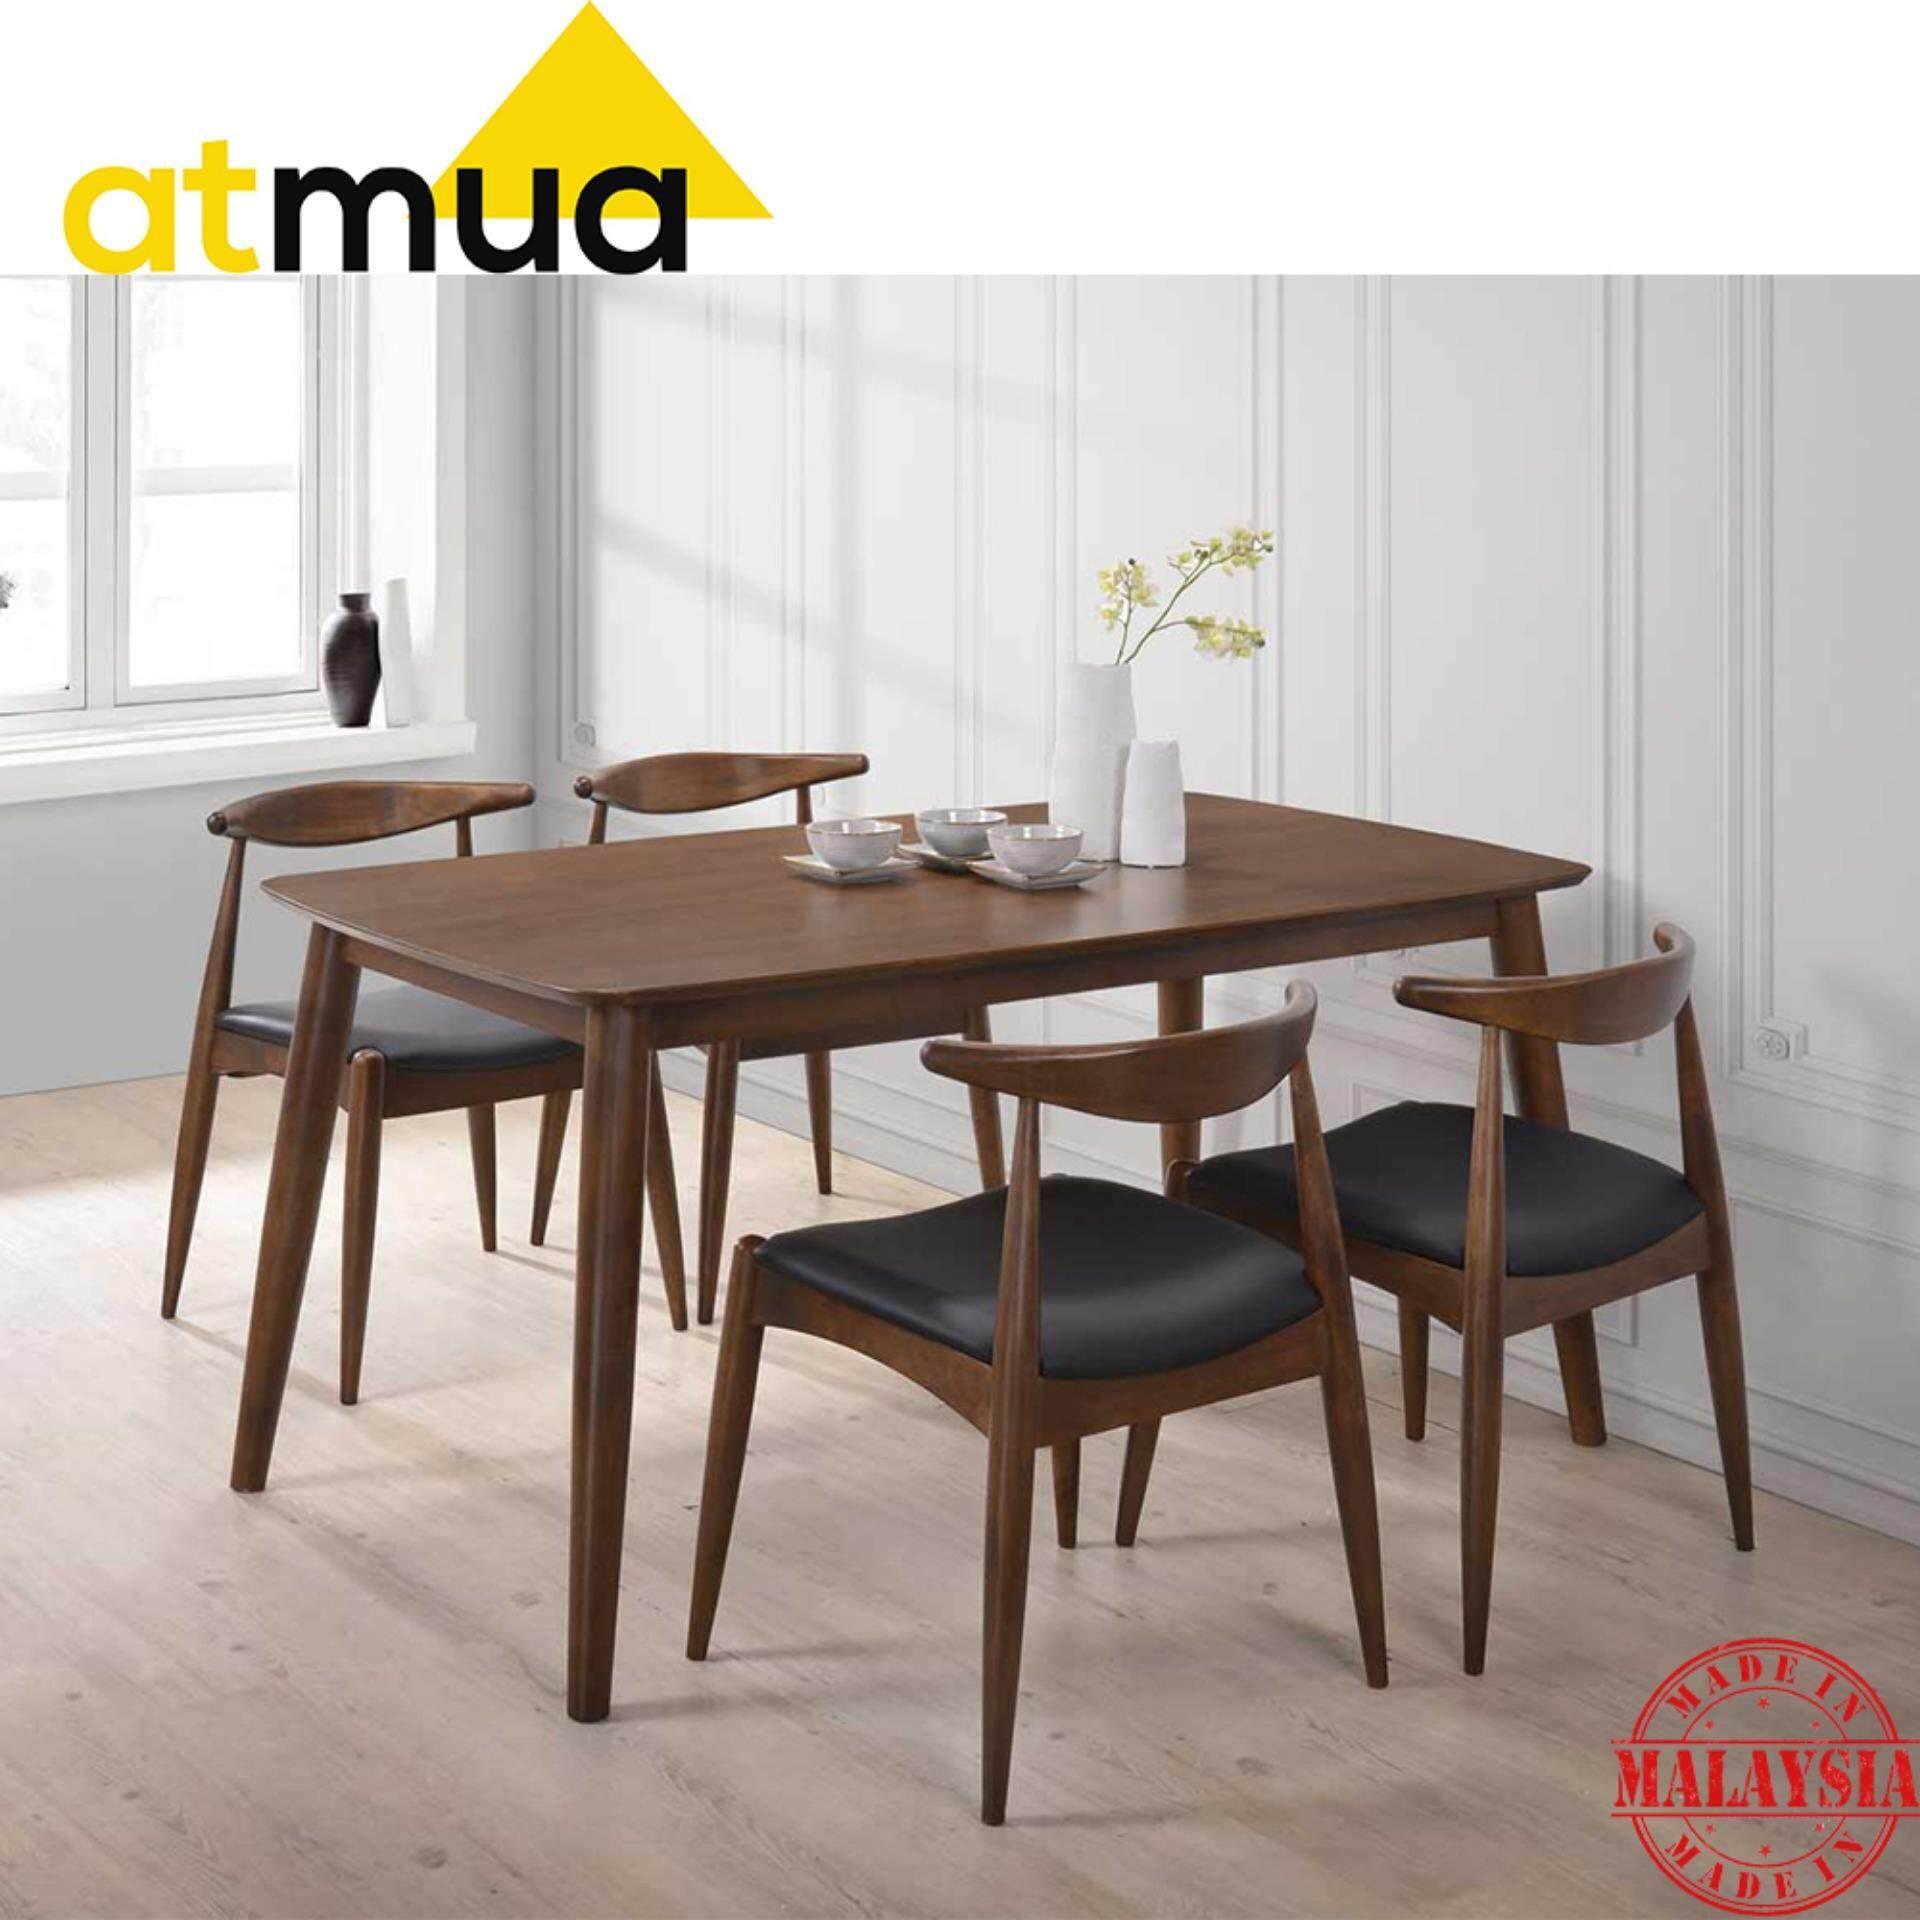 Atmua Olim Scandinavian Dining Set 1